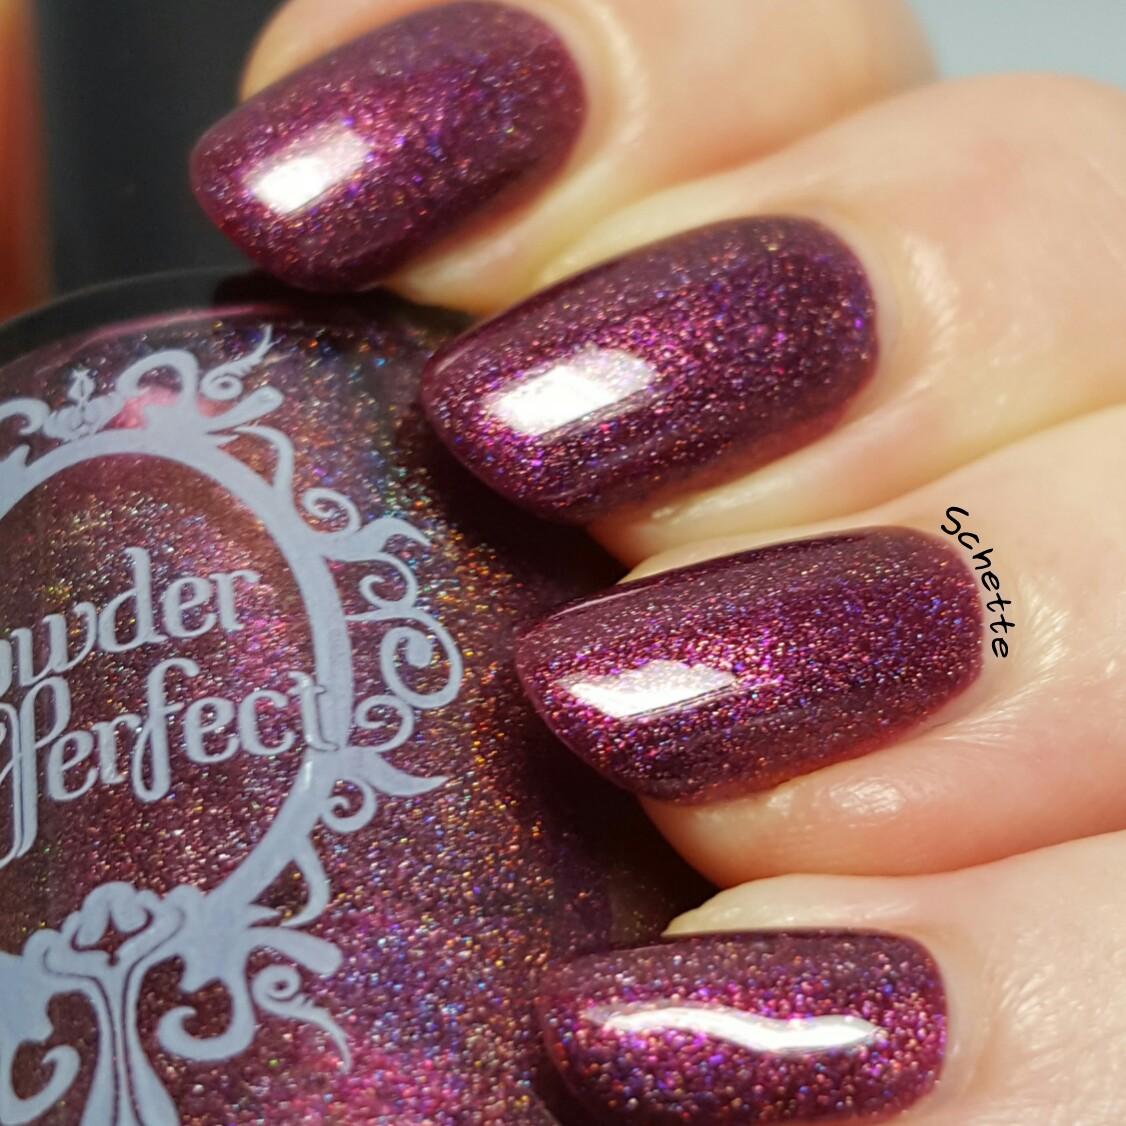 Powder Perfect - La dauphine